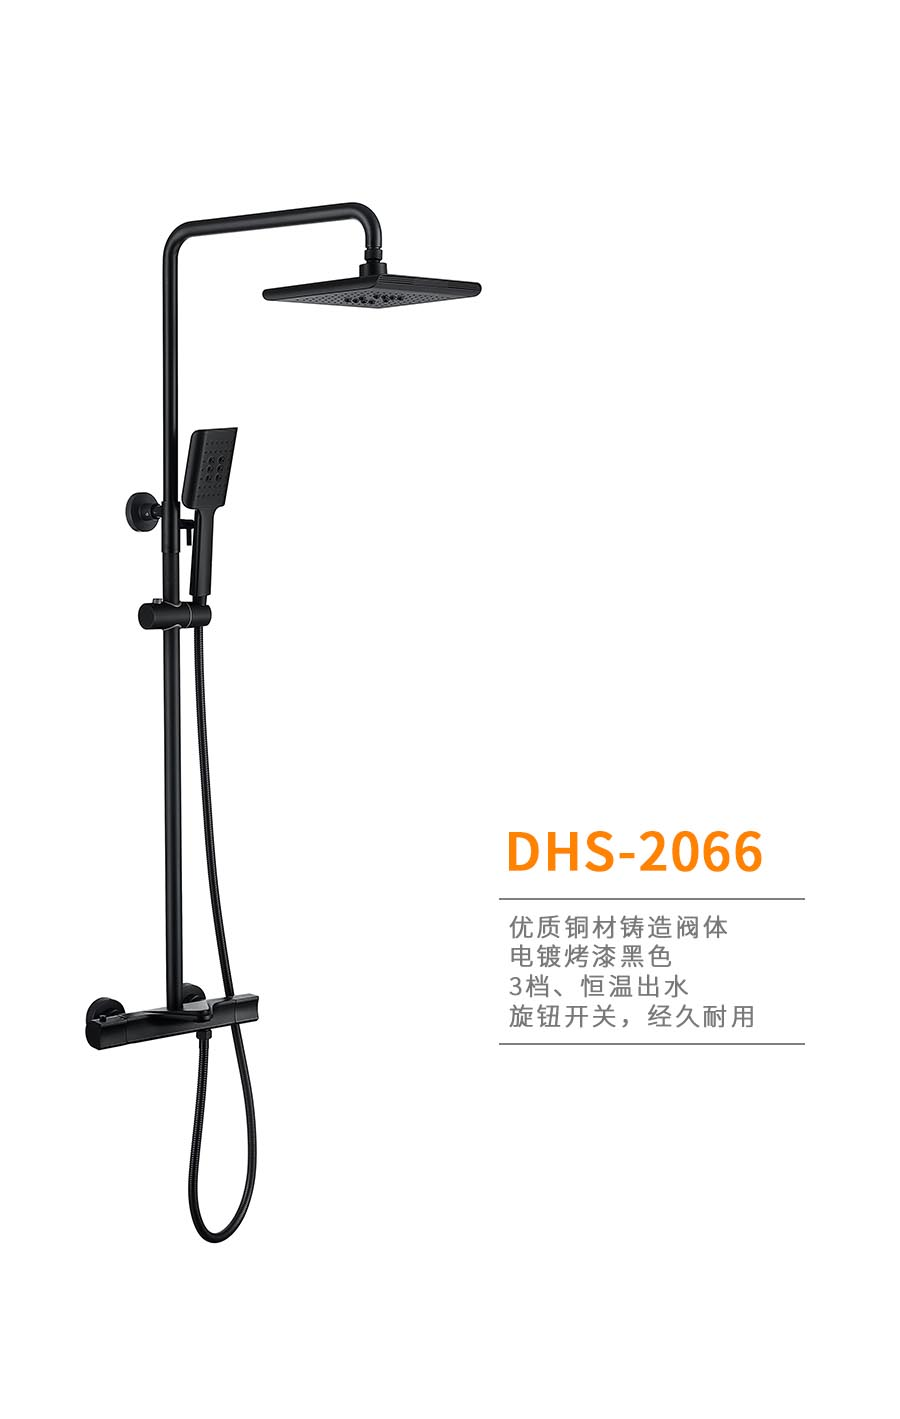 dhs-2066b.jpg